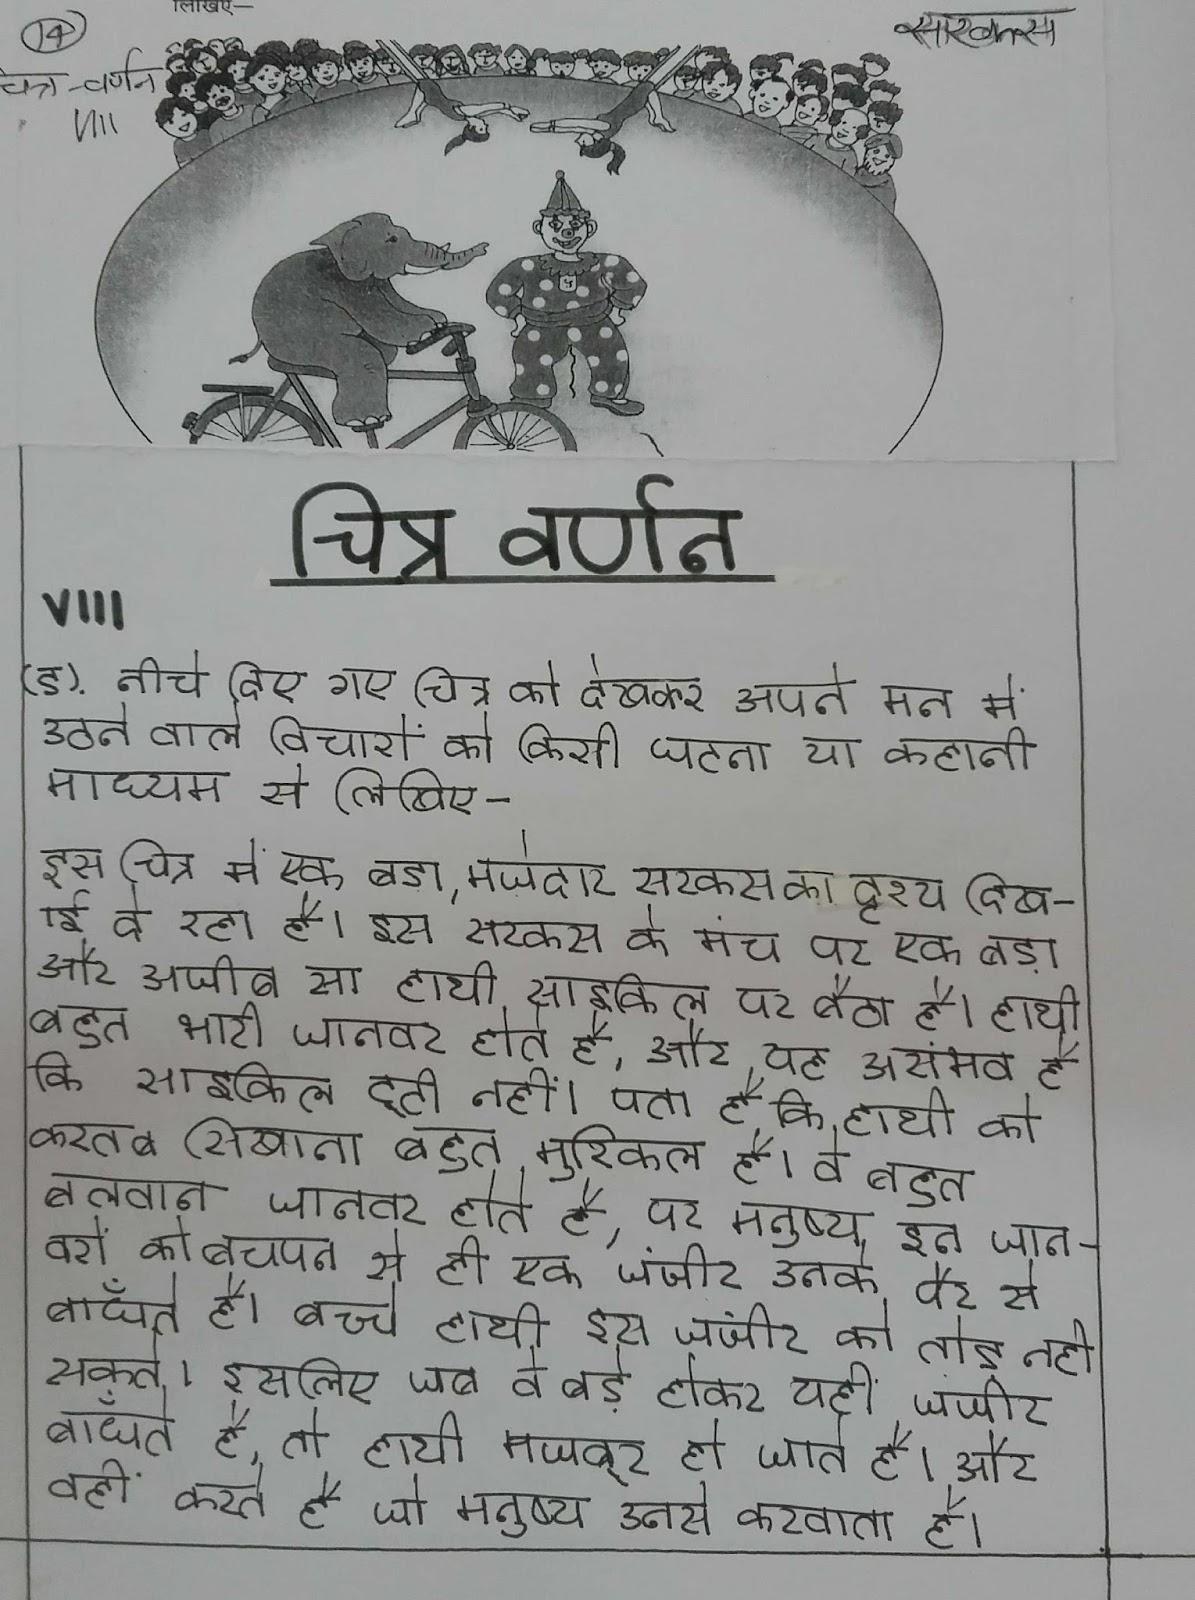 Bachon Ki Kalam Se Circus Picture Composition